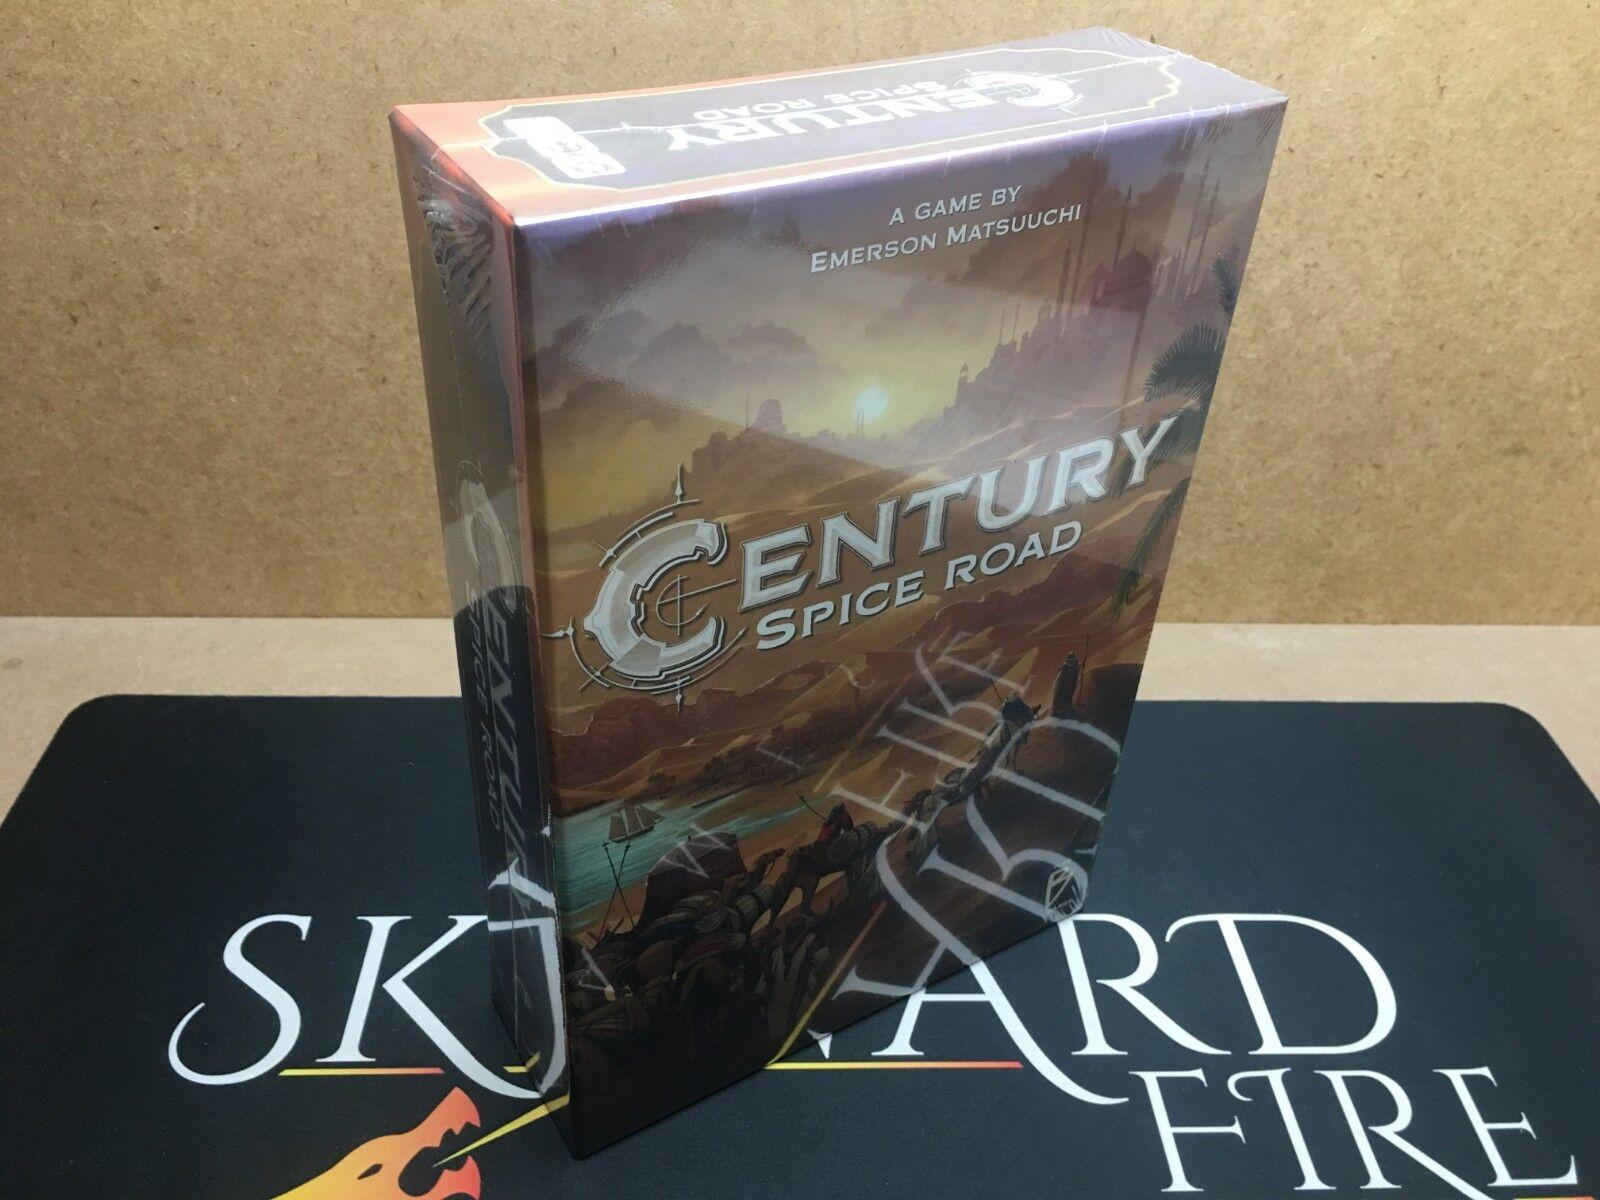 Century  Spice Road - Plan B Games (Genuine Sealed)